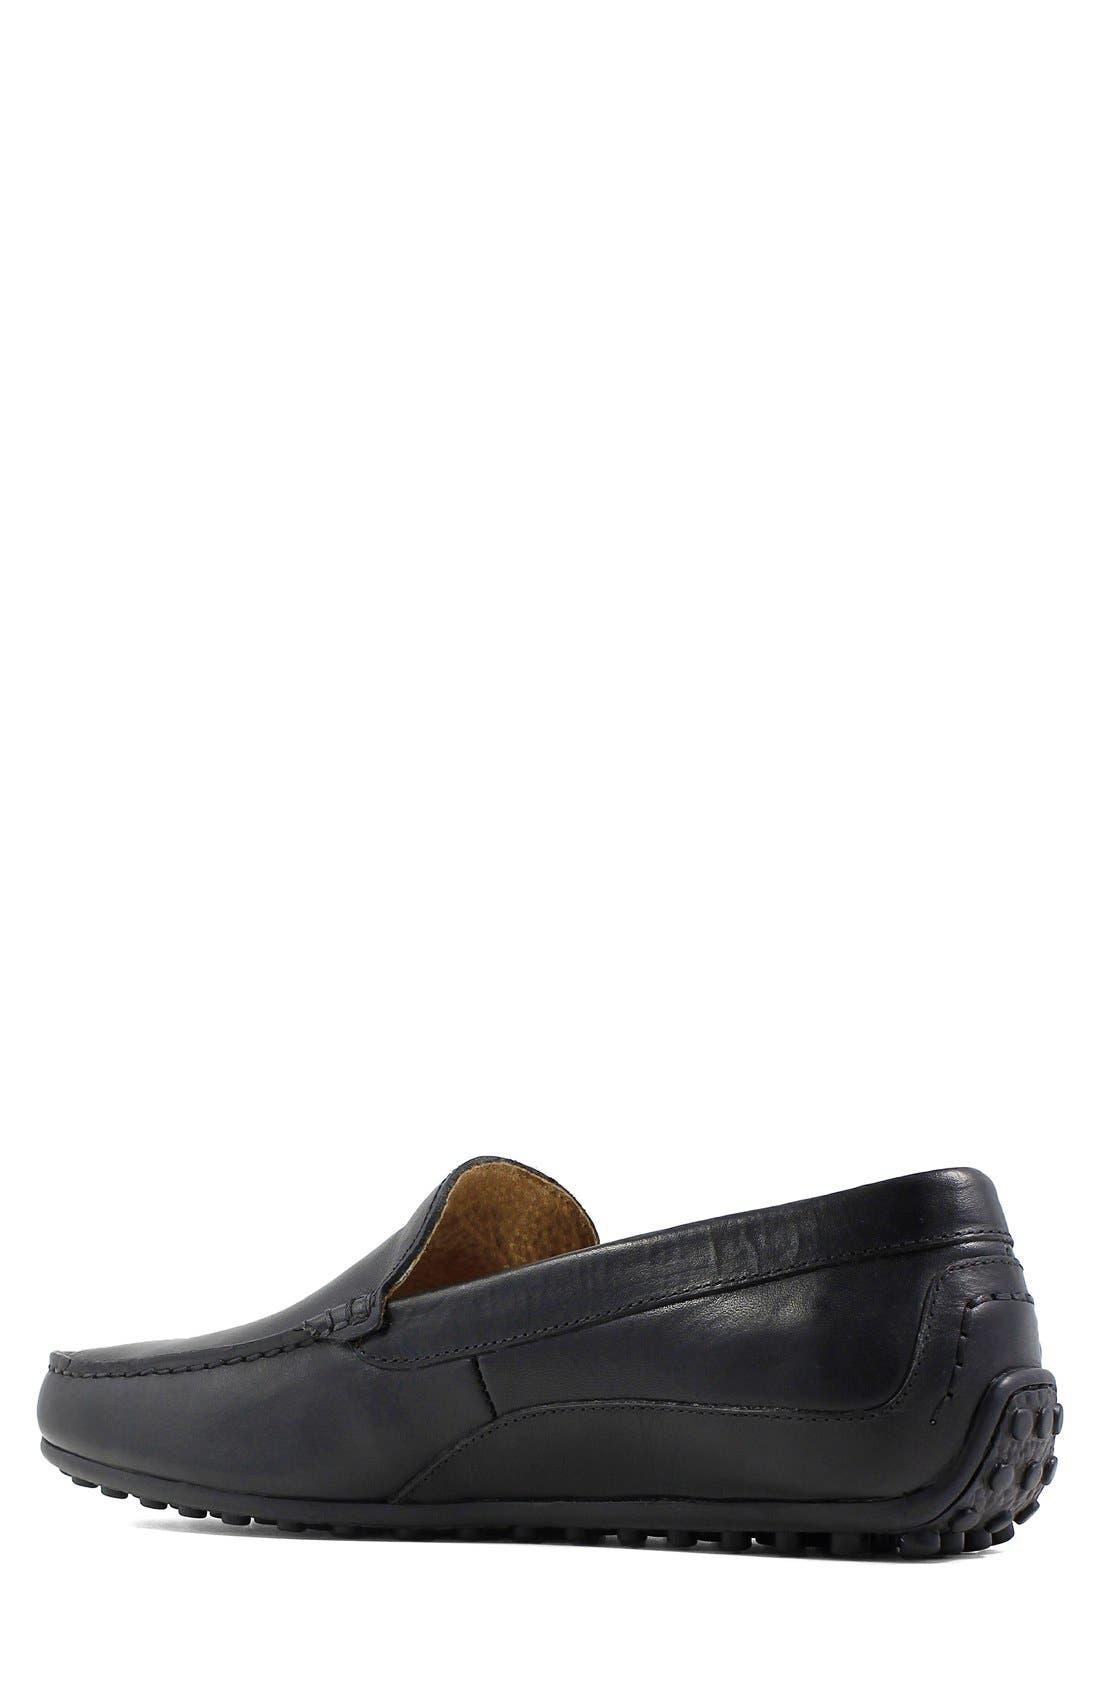 FLORSHEIM, Oval Driving Shoe, Alternate thumbnail 5, color, BLACK LEATHER